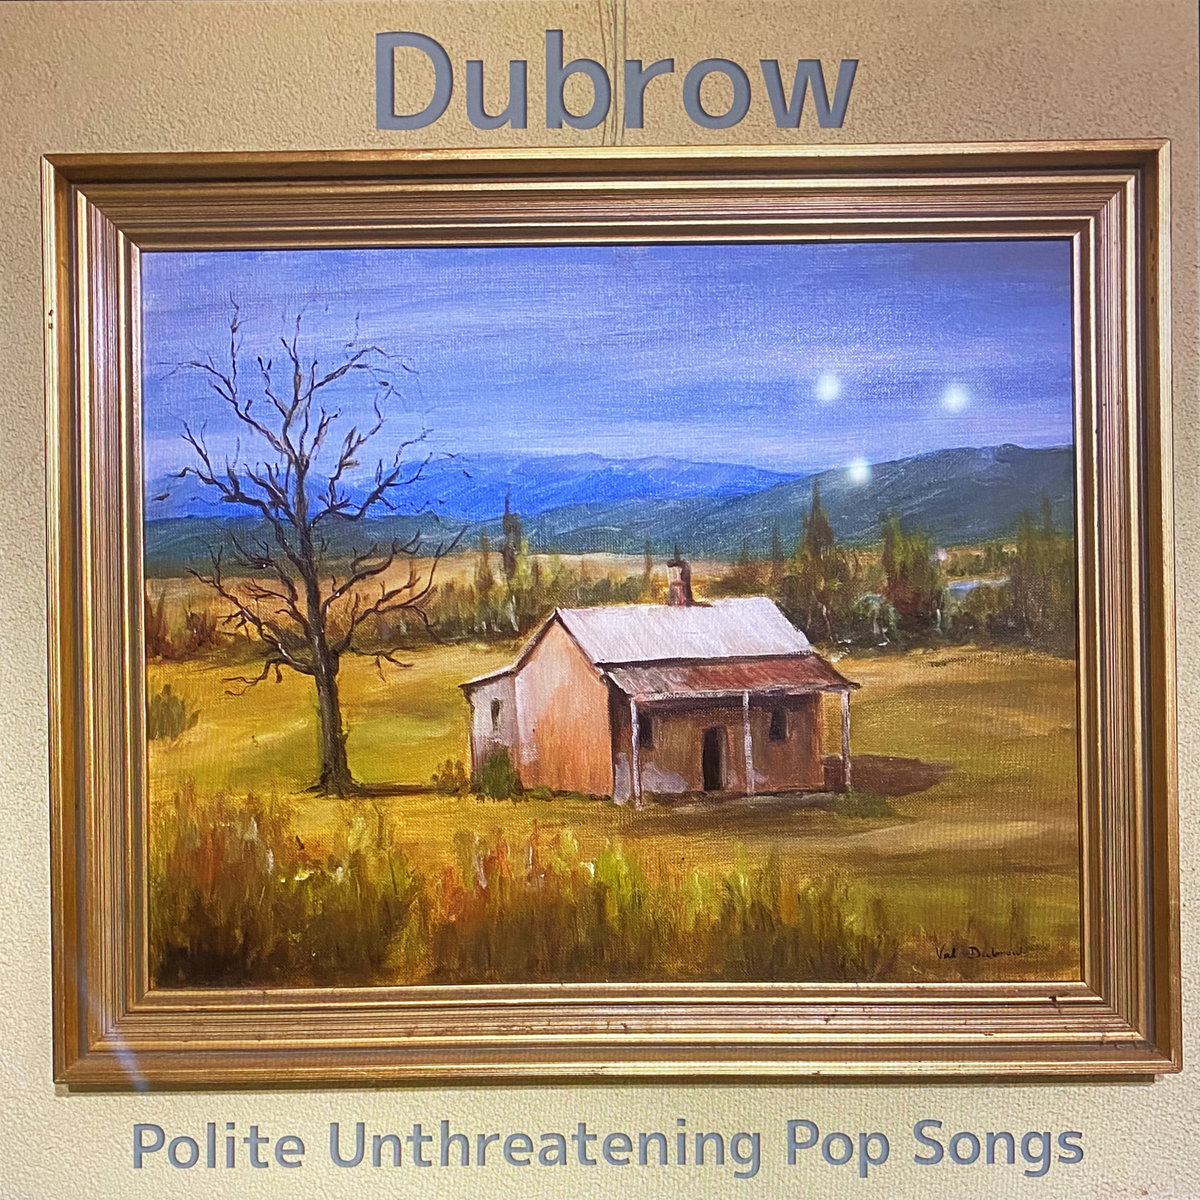 DUBROW - POLITE UNTHREATENING POP SONGS album artwork